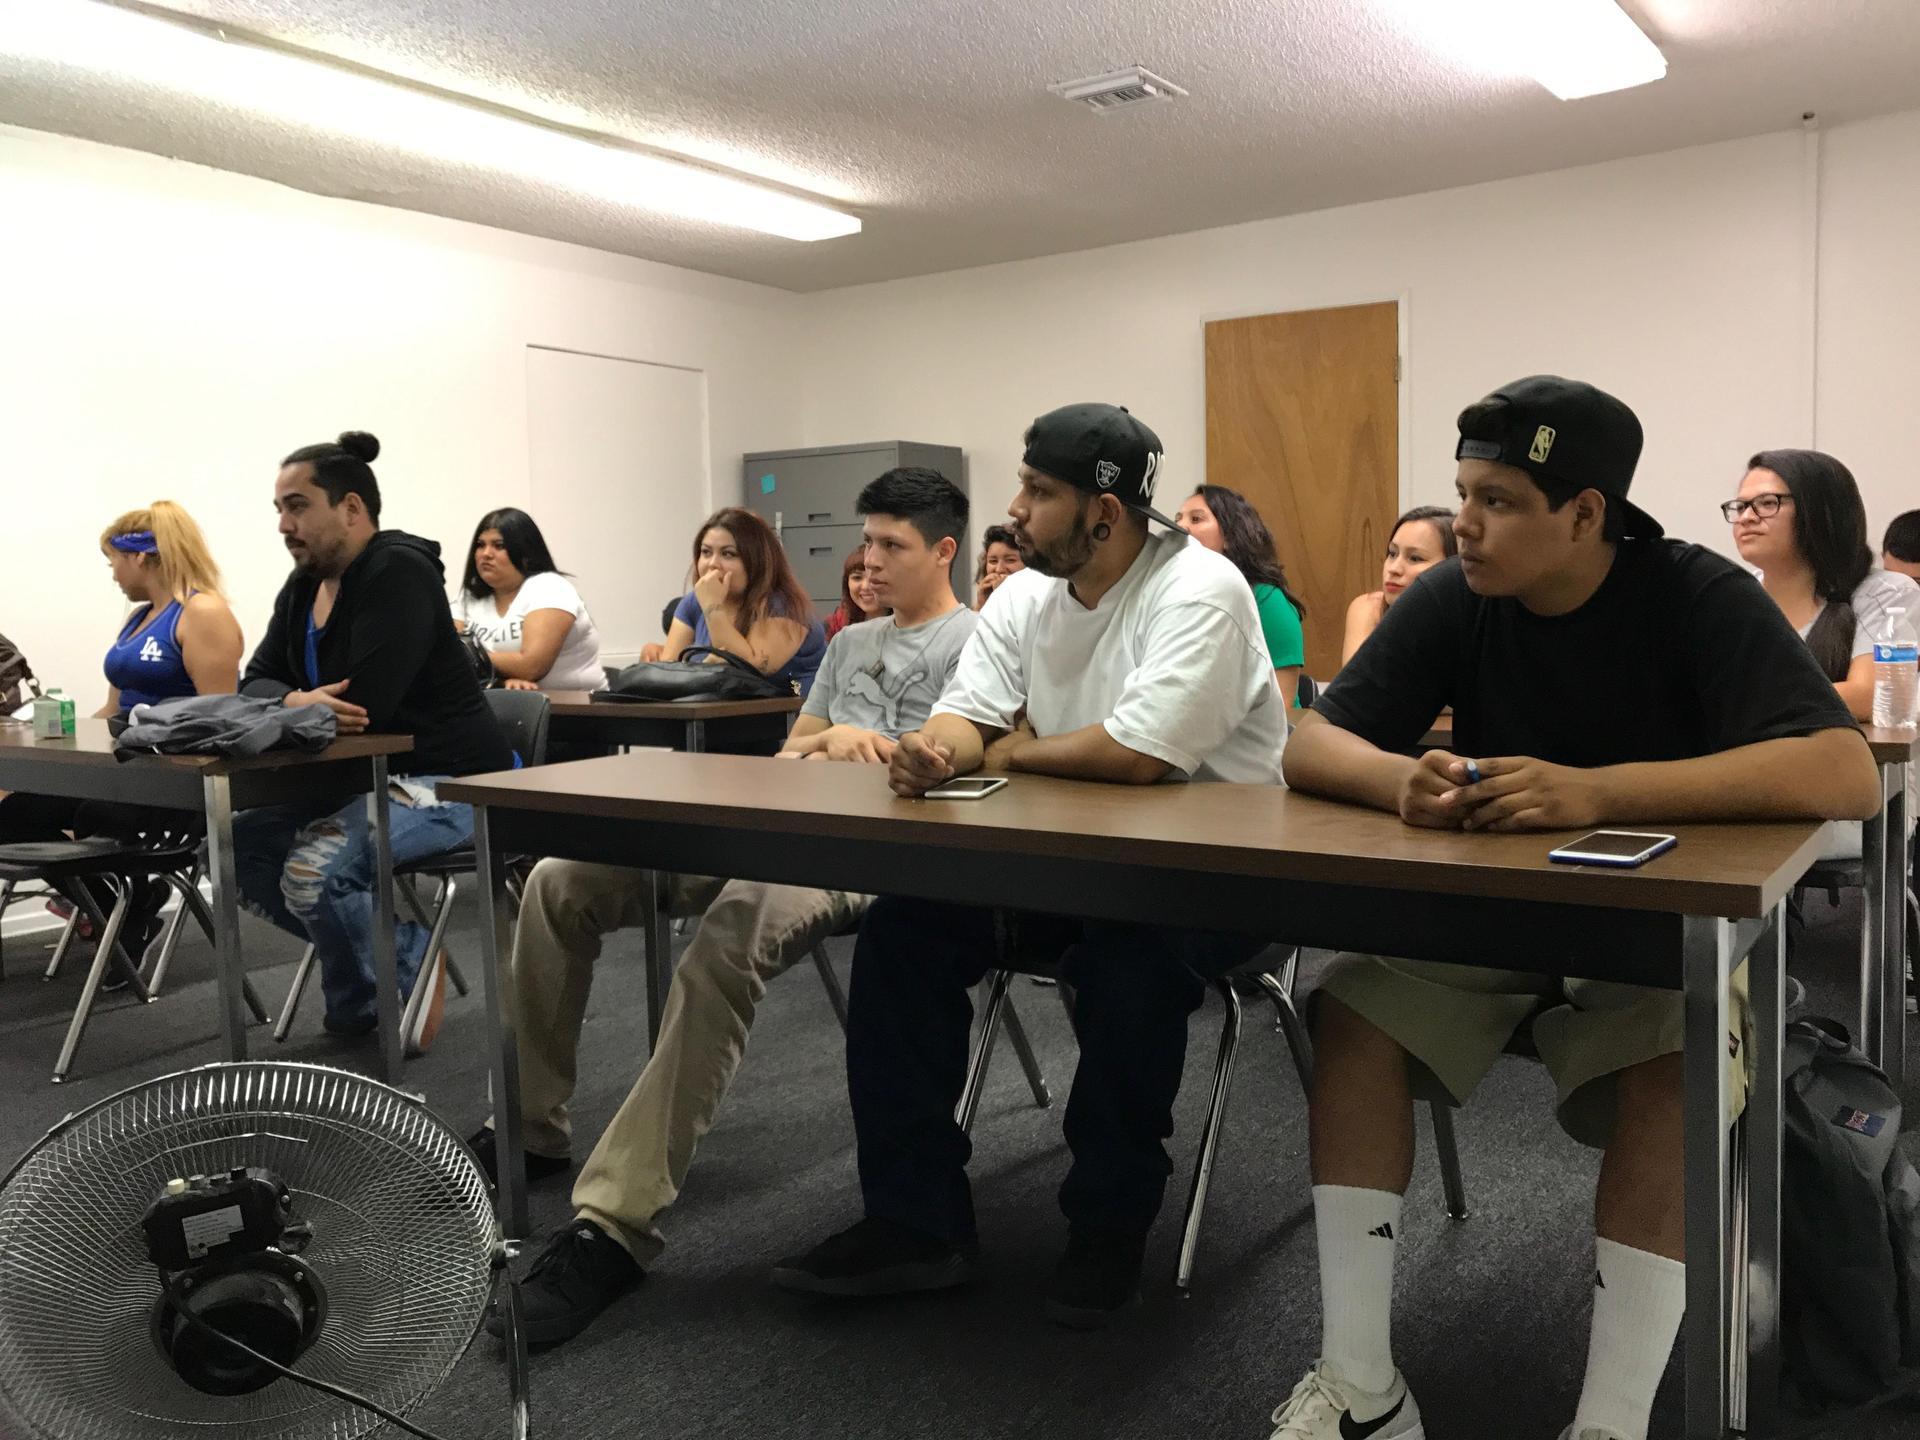 LA CAUSA students in class